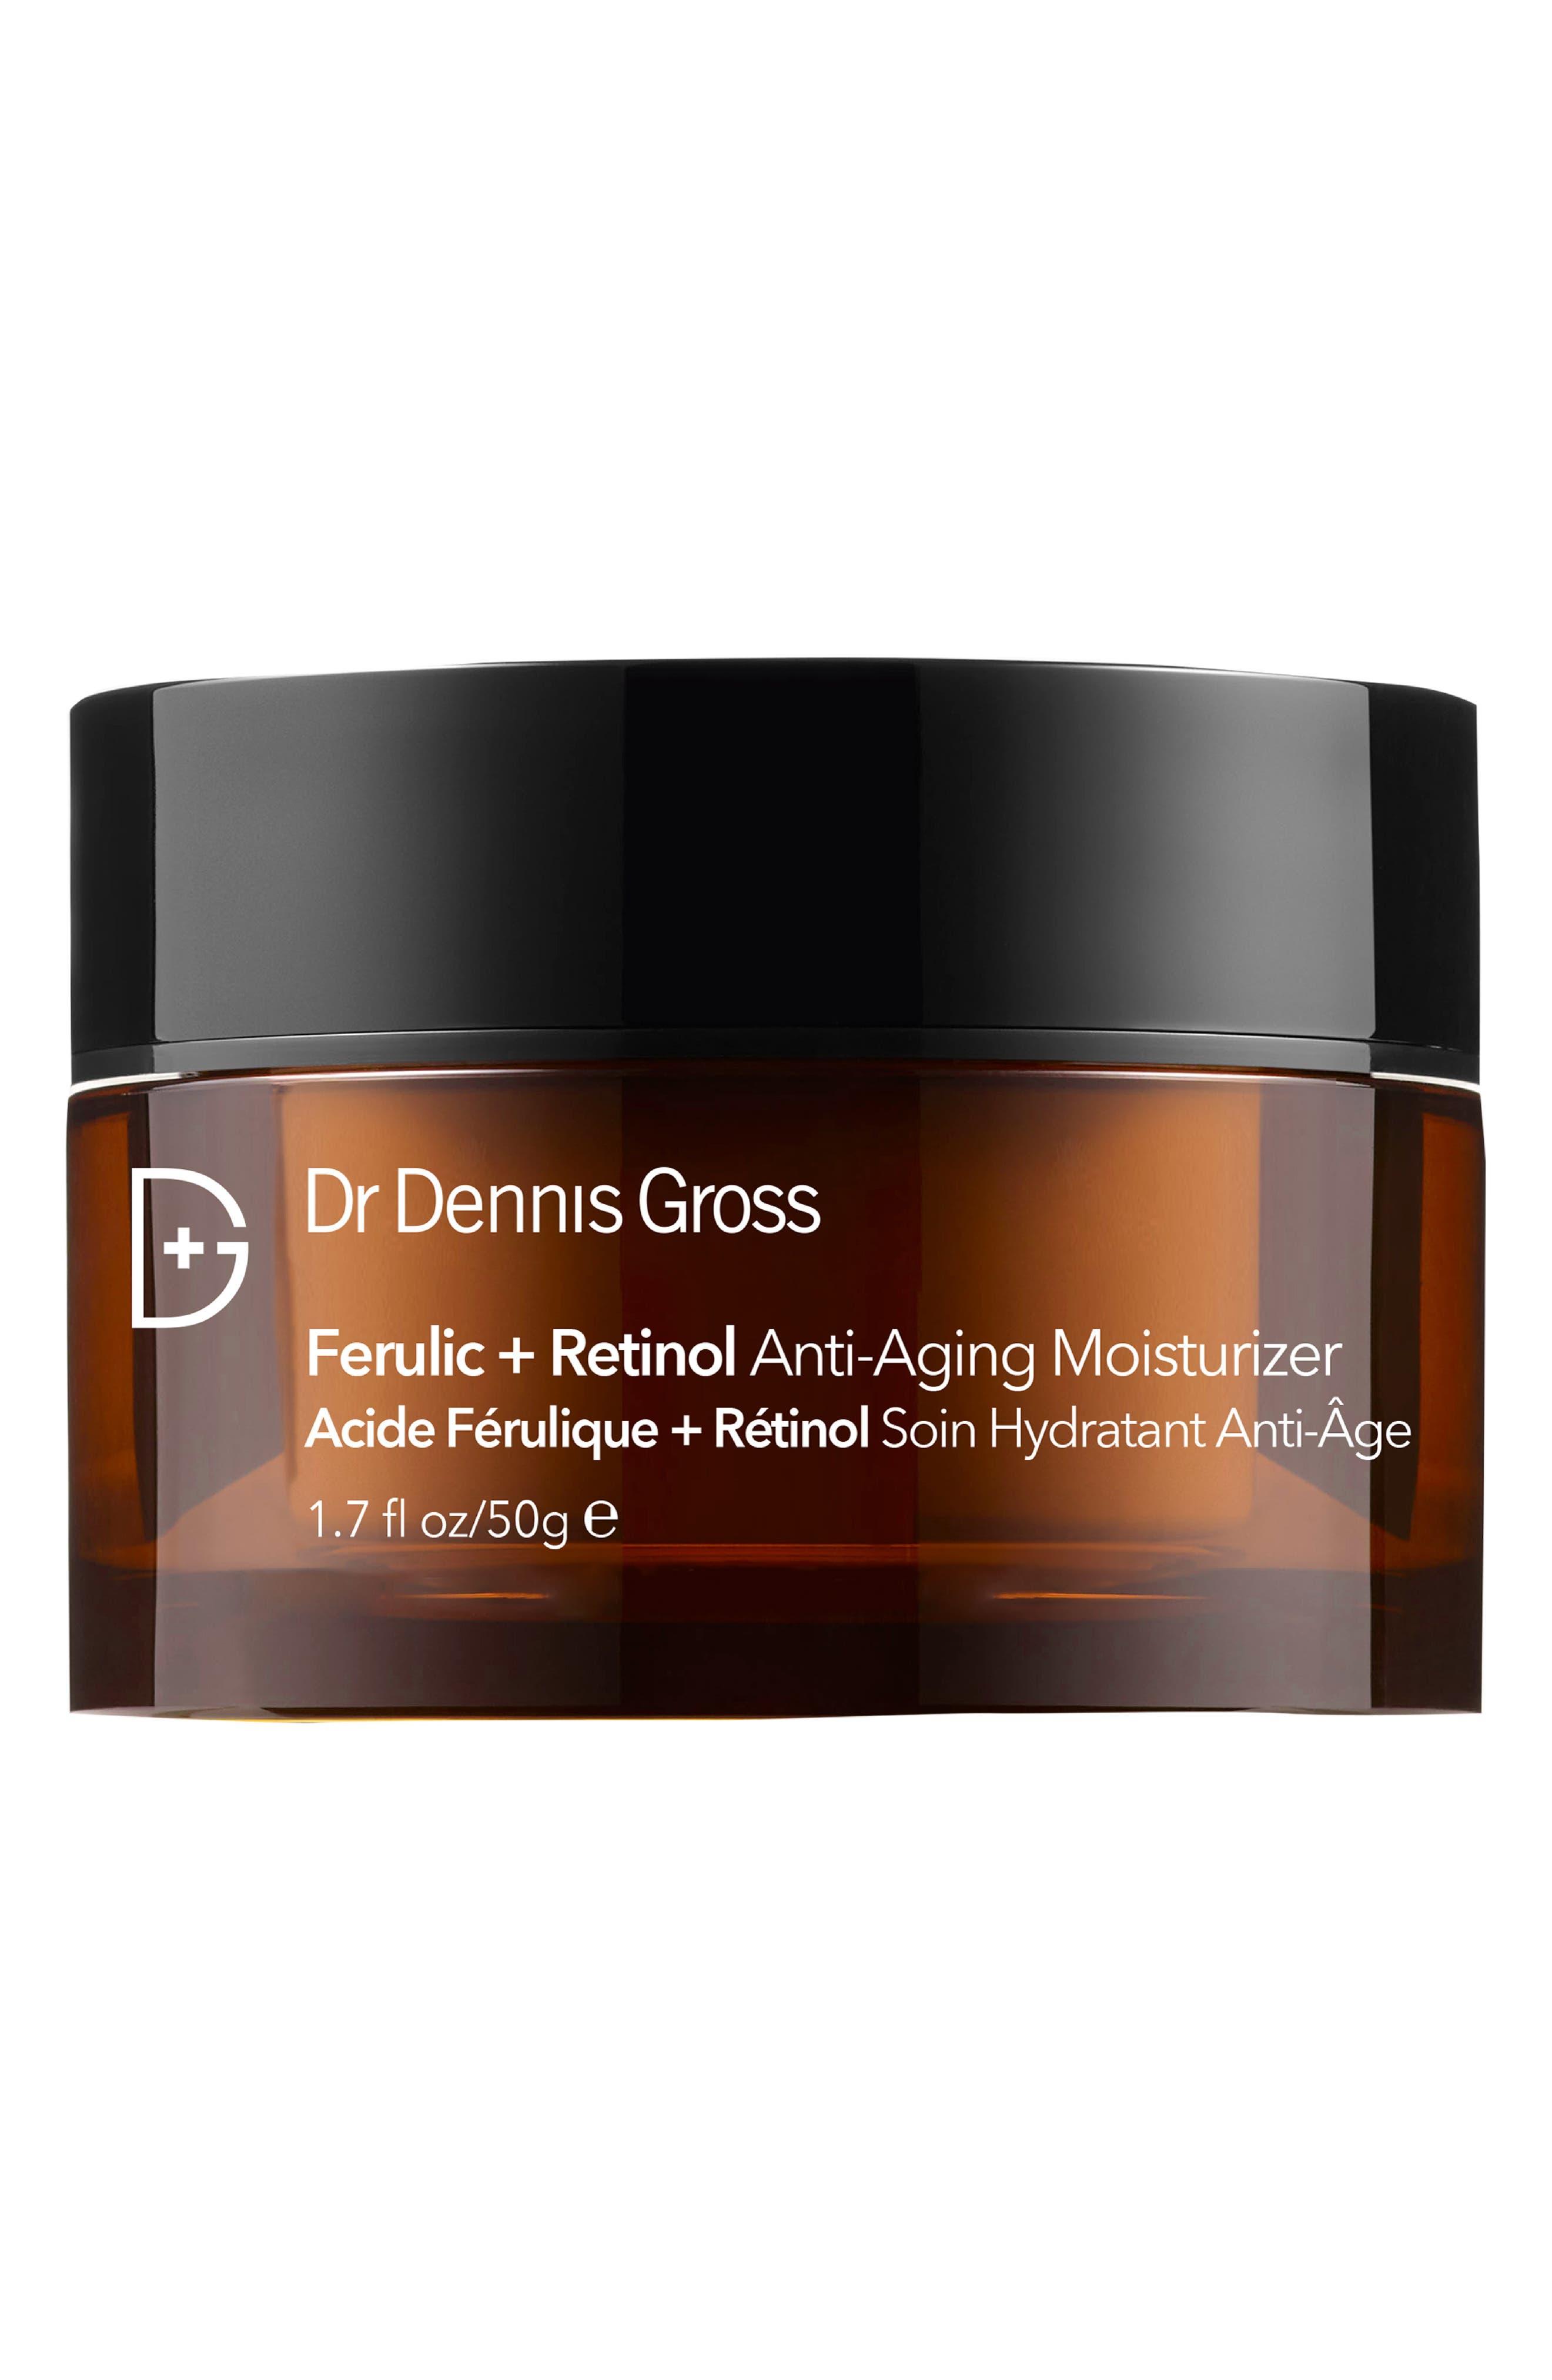 Skincare Ferulic + Retinol Anti-Aging Moisturizer